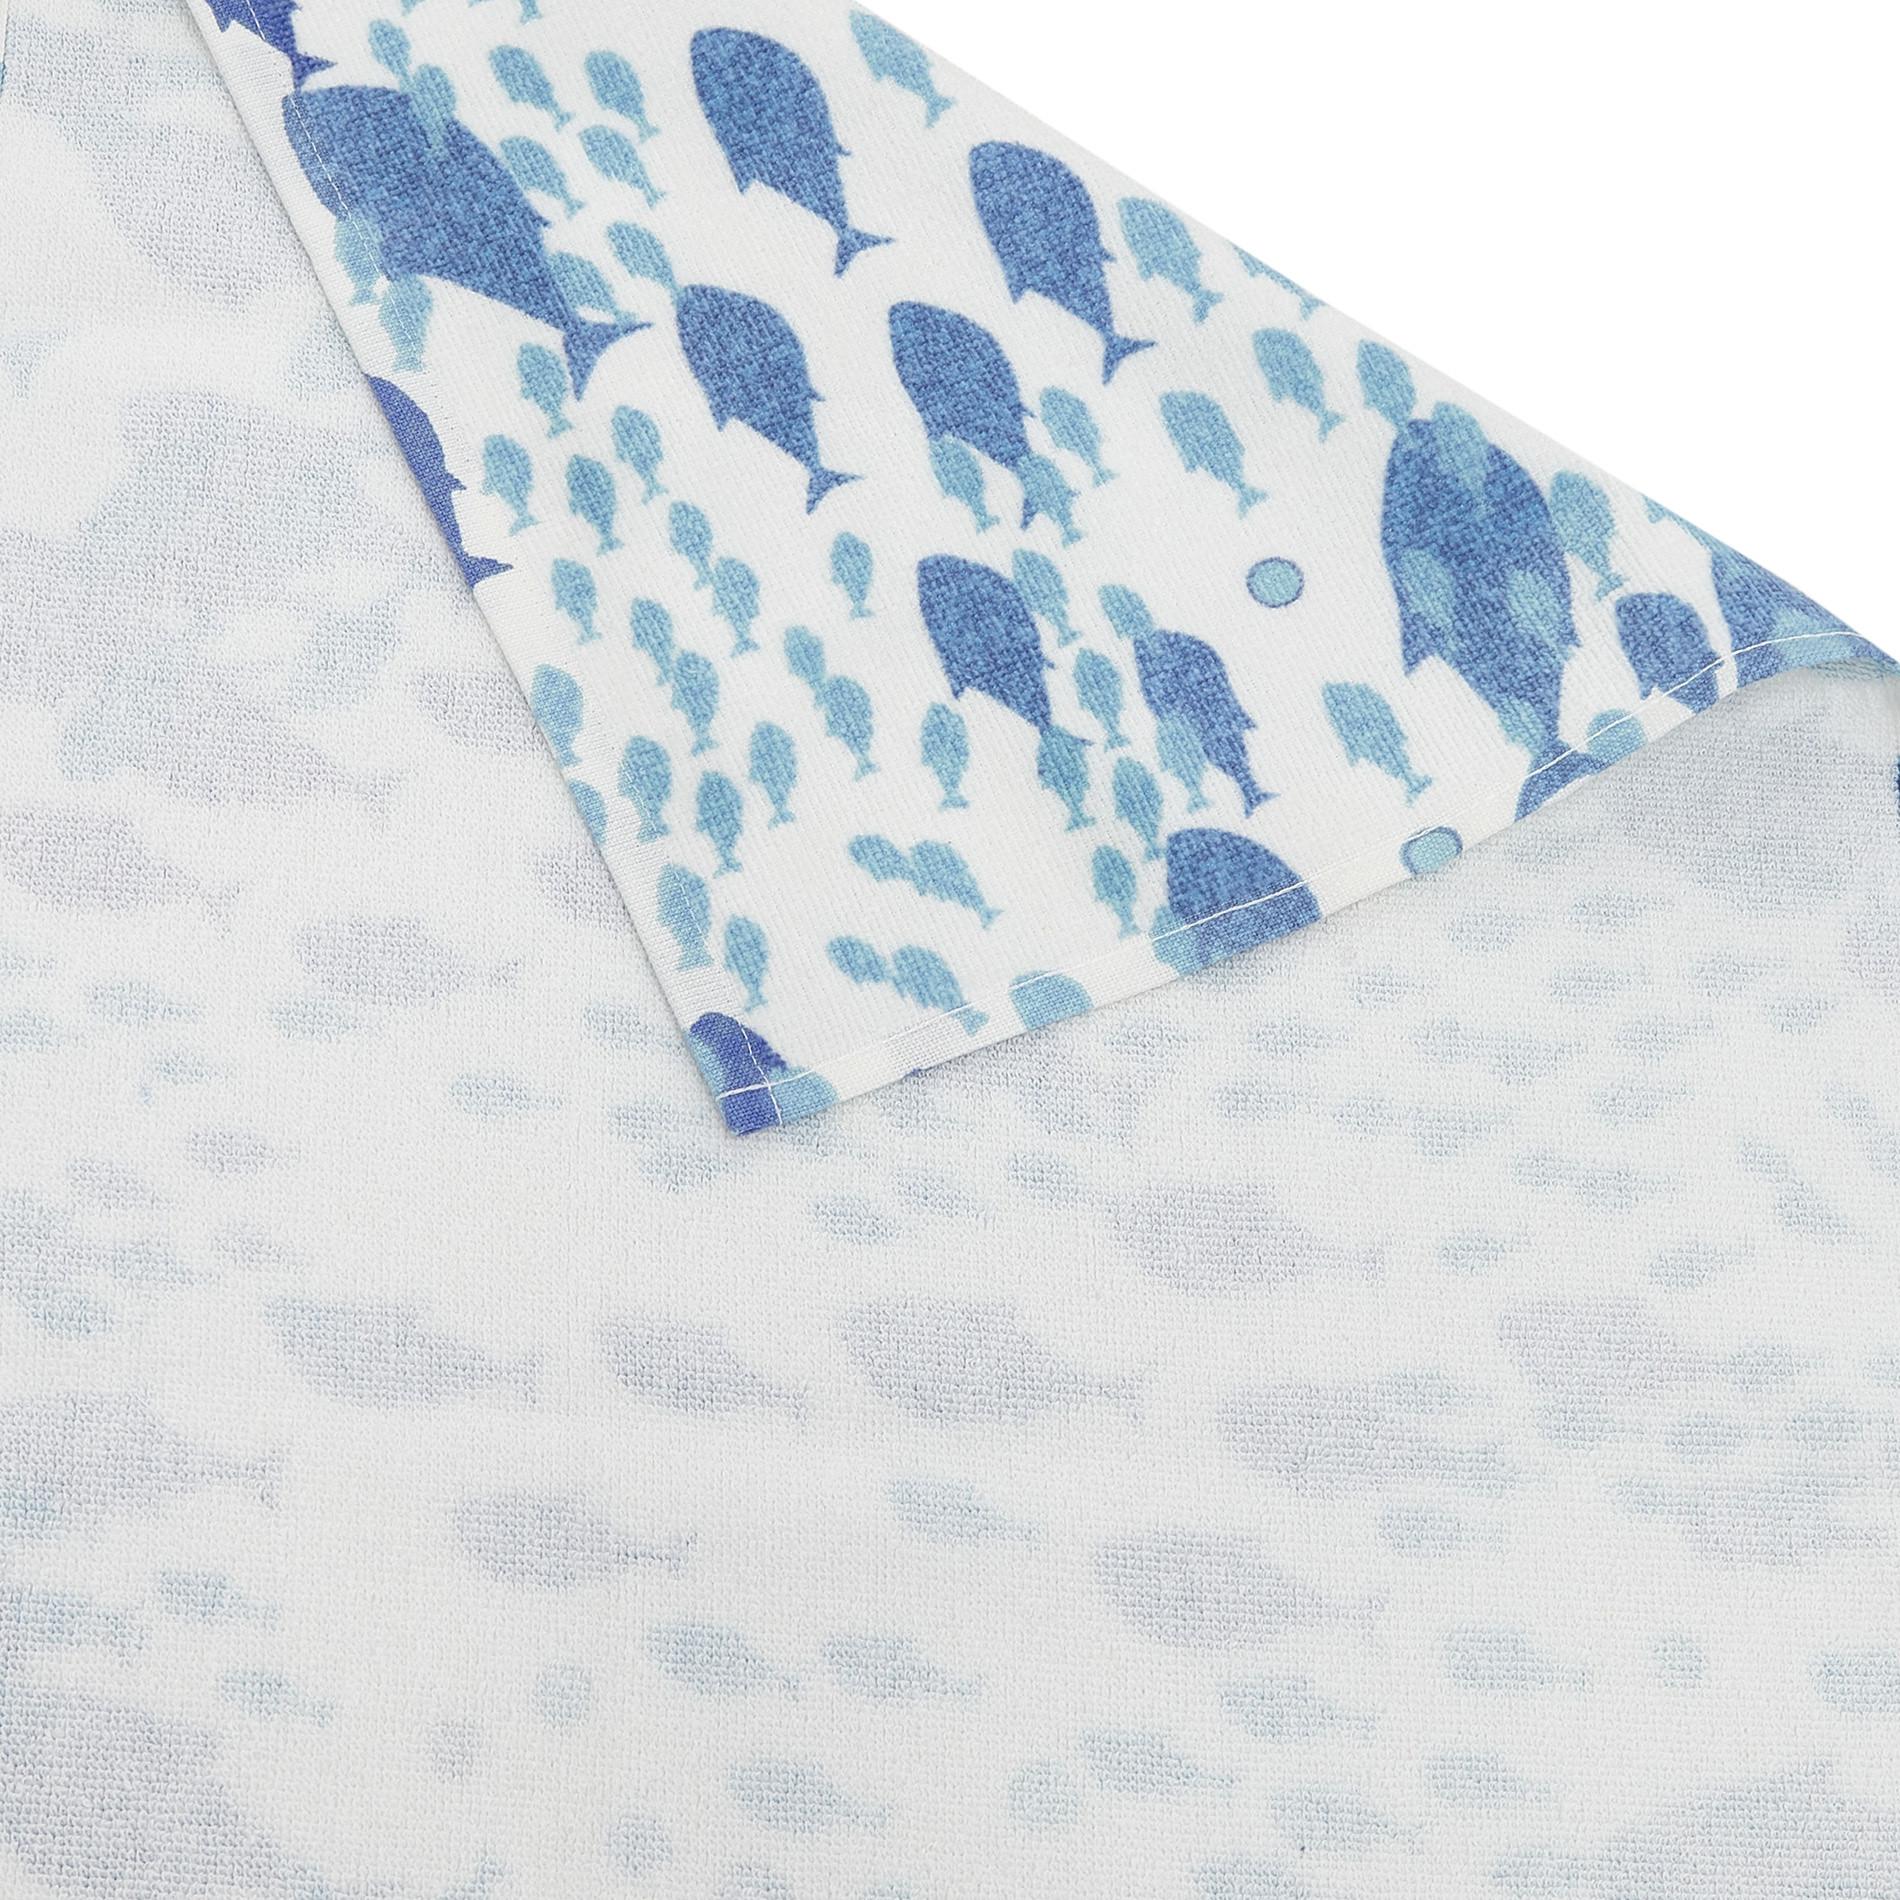 Asciugamano cotone velour stampa pesci, Bianco, large image number 2